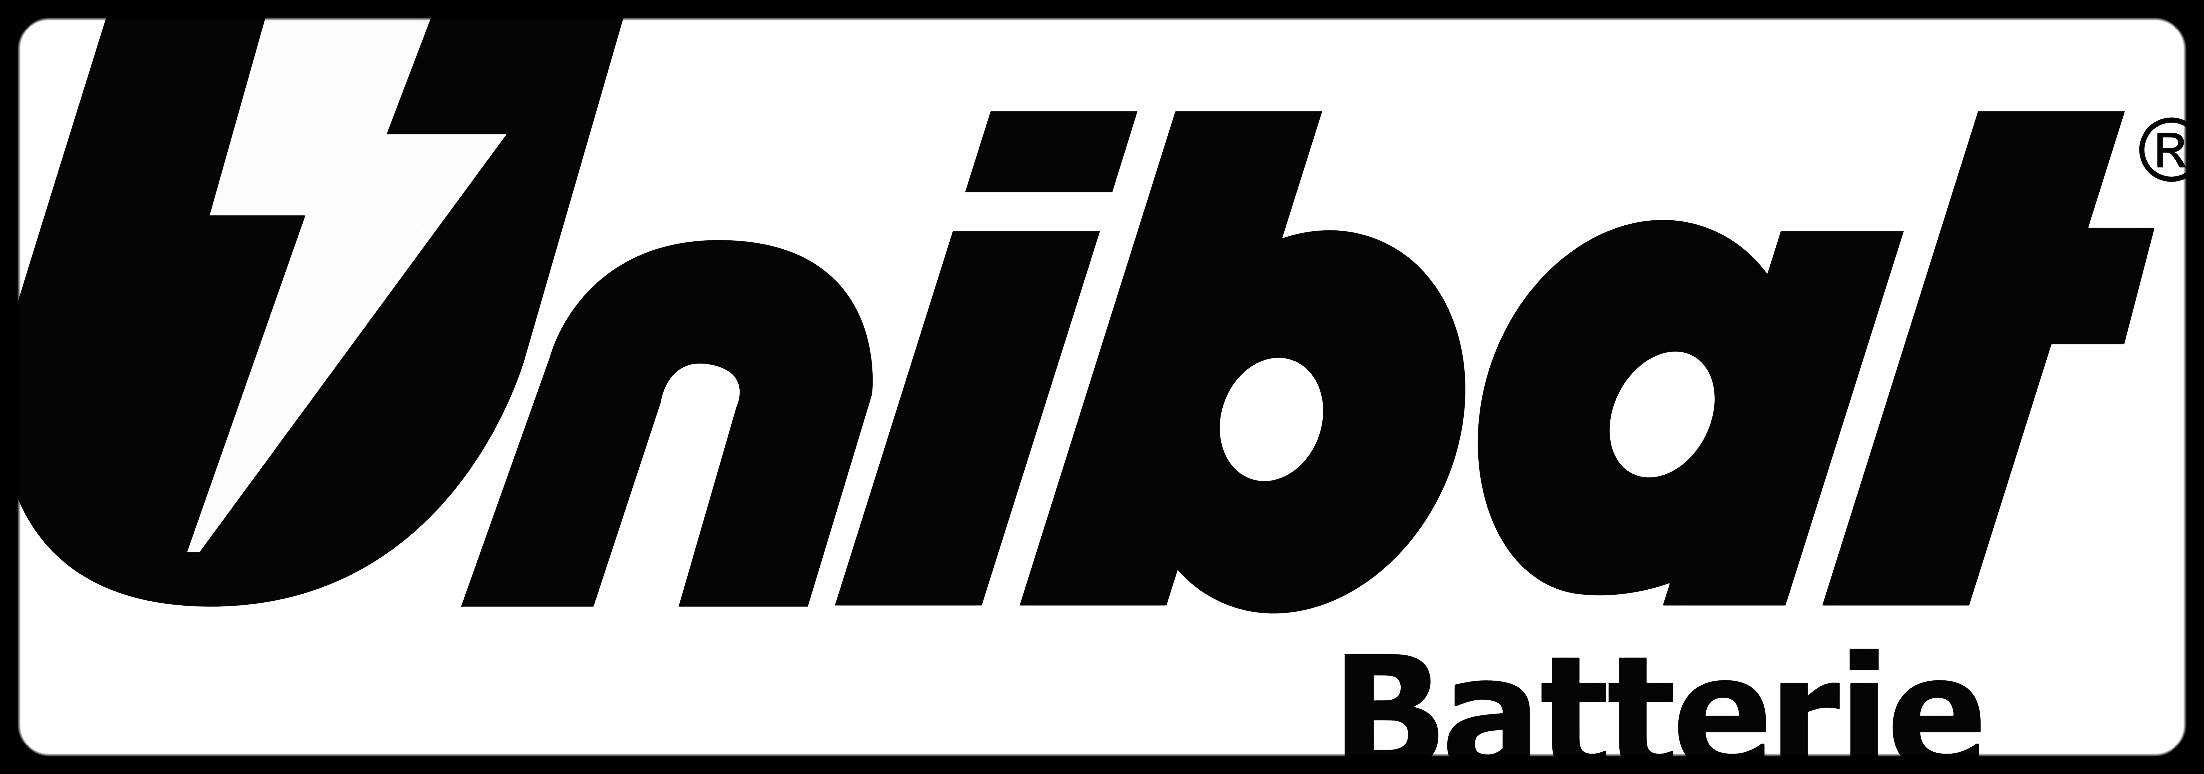 Unibat_logo 1.jpg